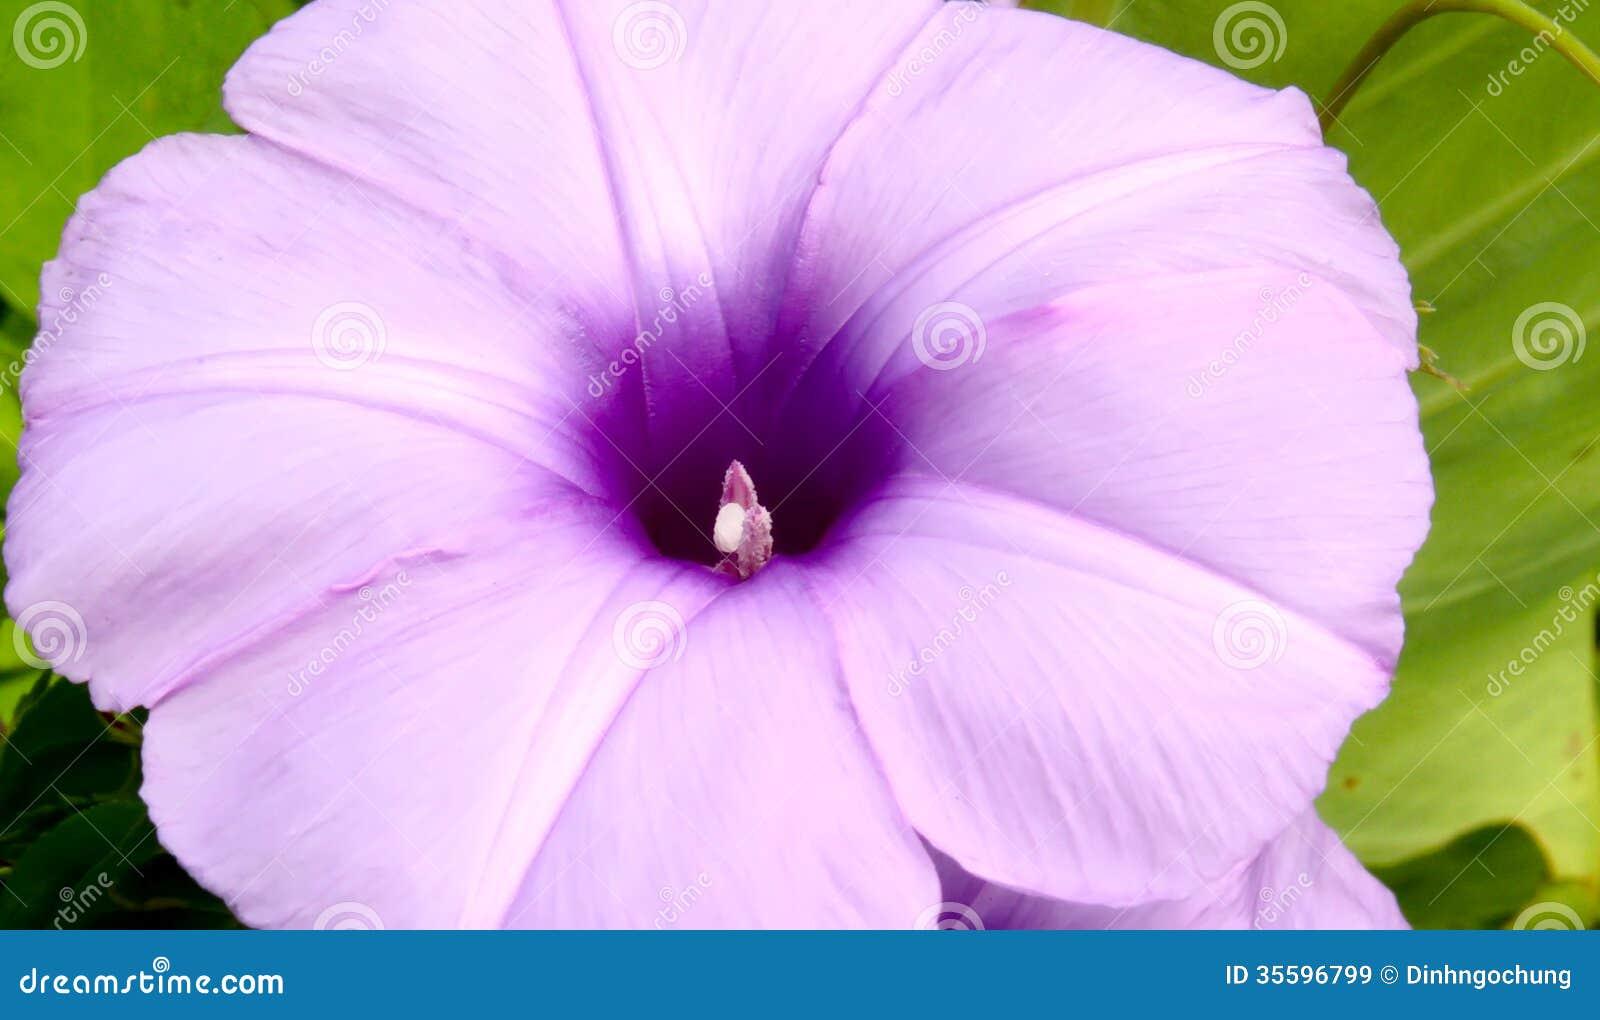 Convolvulus flowers small, thin purple